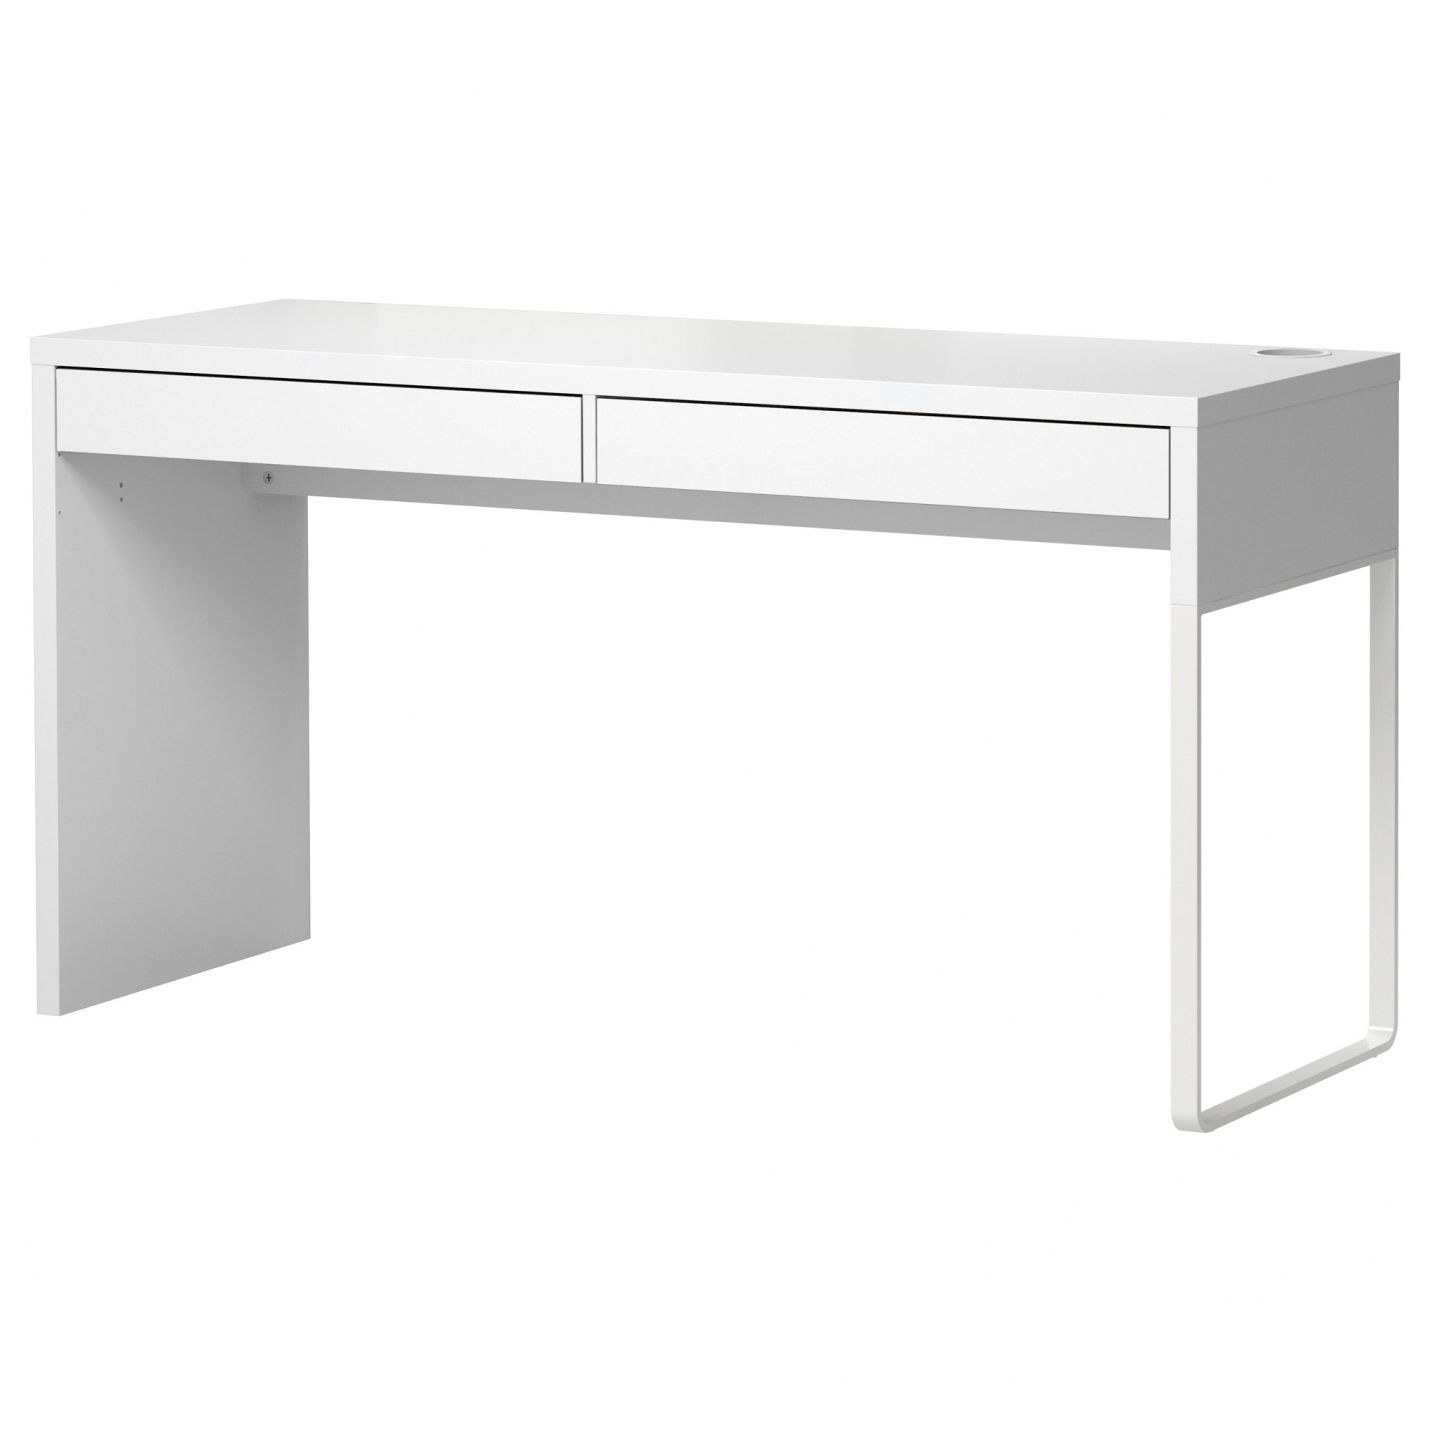 Modern Computer Desk Ikea - ashley Furniture Home Office Check more ...